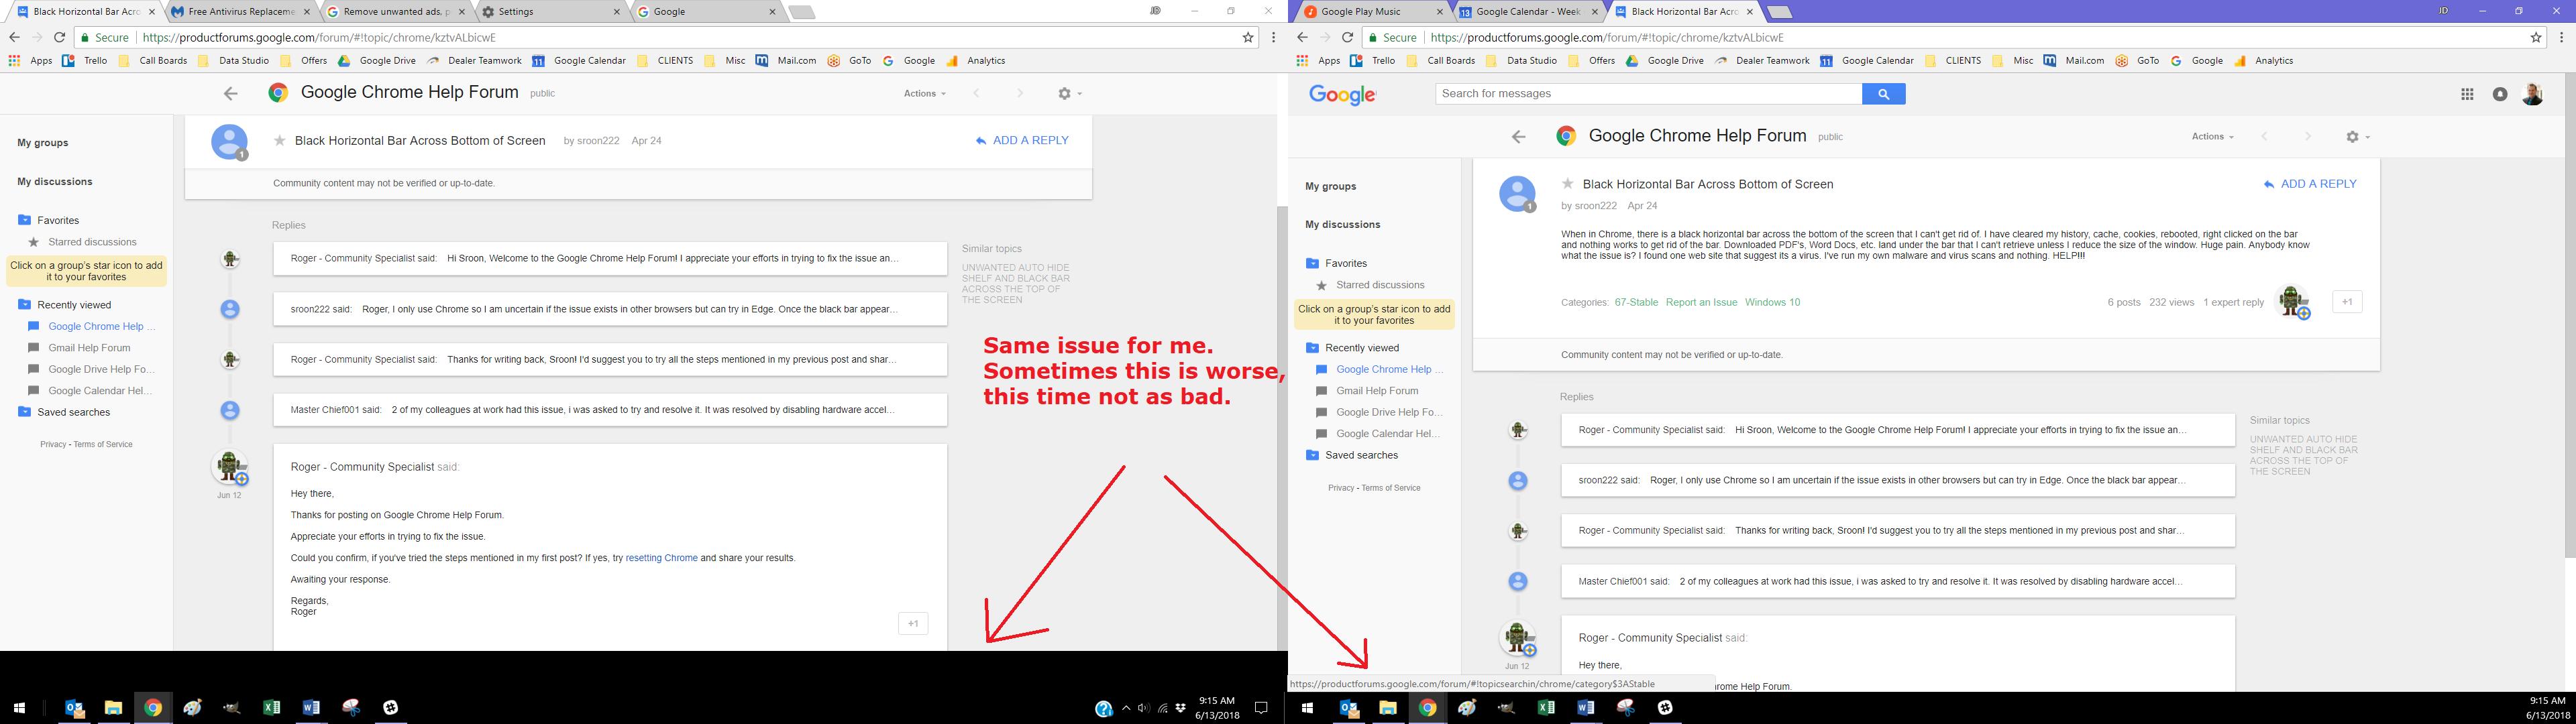 Black Horizontal Bar Across Bottom of Screen - Google Chrome Help